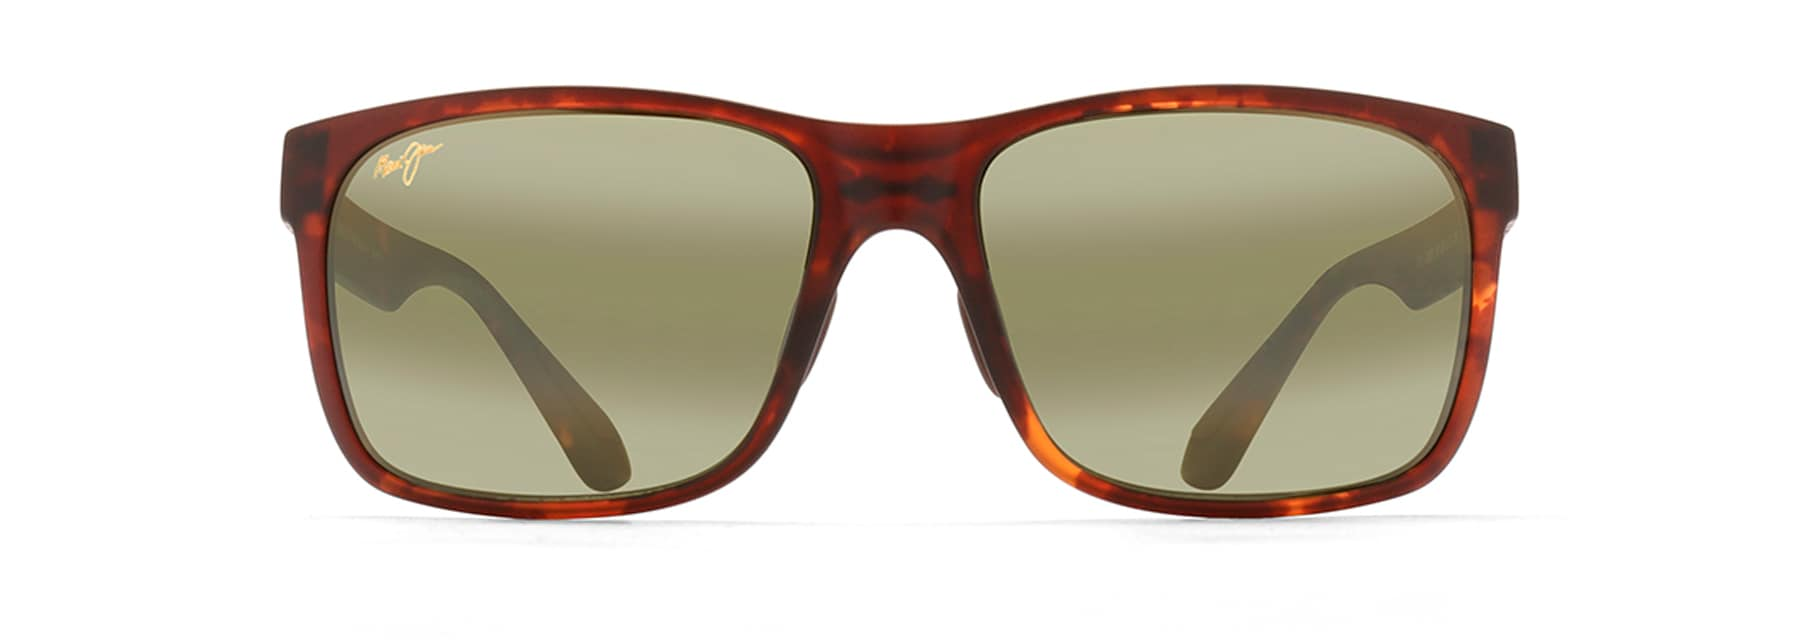 b3ed66204f Red Sands Polarized Sunglasses   Maui Jim®